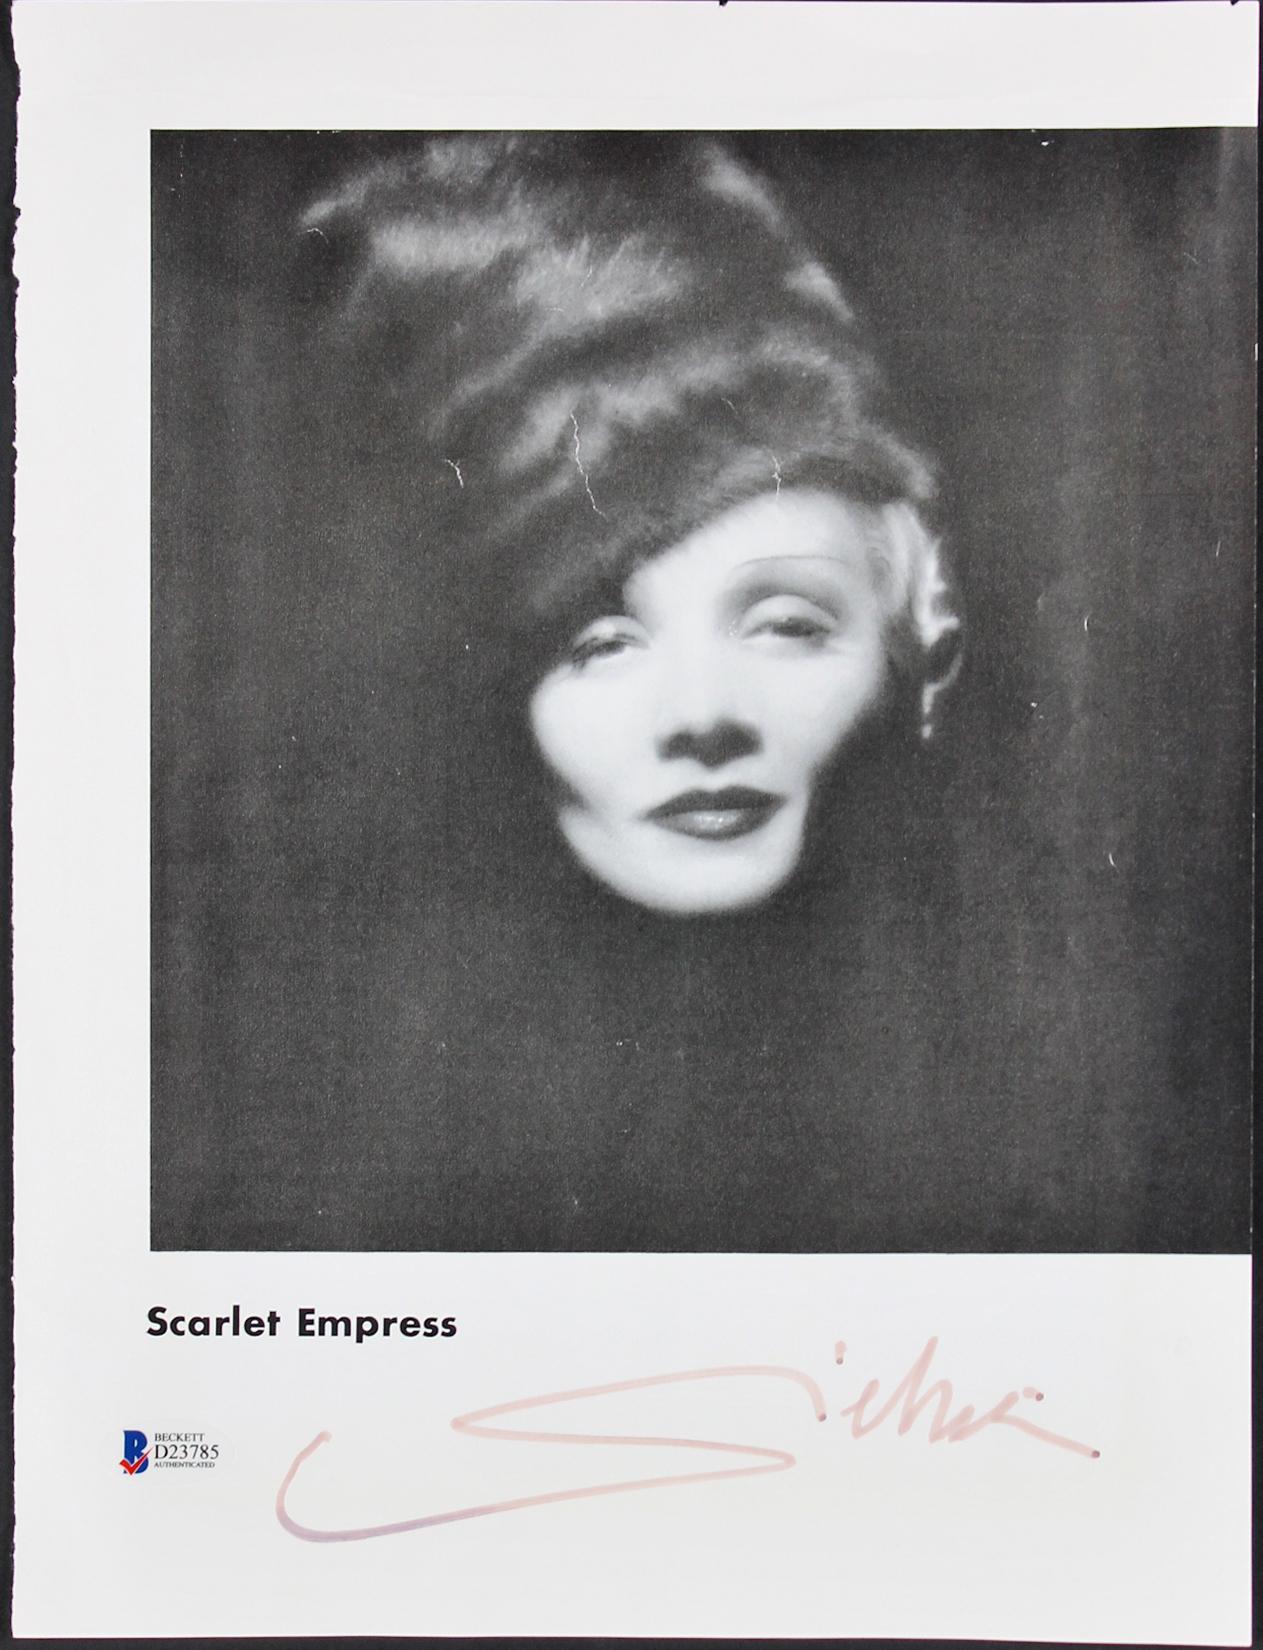 02a936e9103 $149.99 - Marlene Dietrich Scarlet Empress Signed 9.25X13.25 Magazine Photo  BAS #D23785